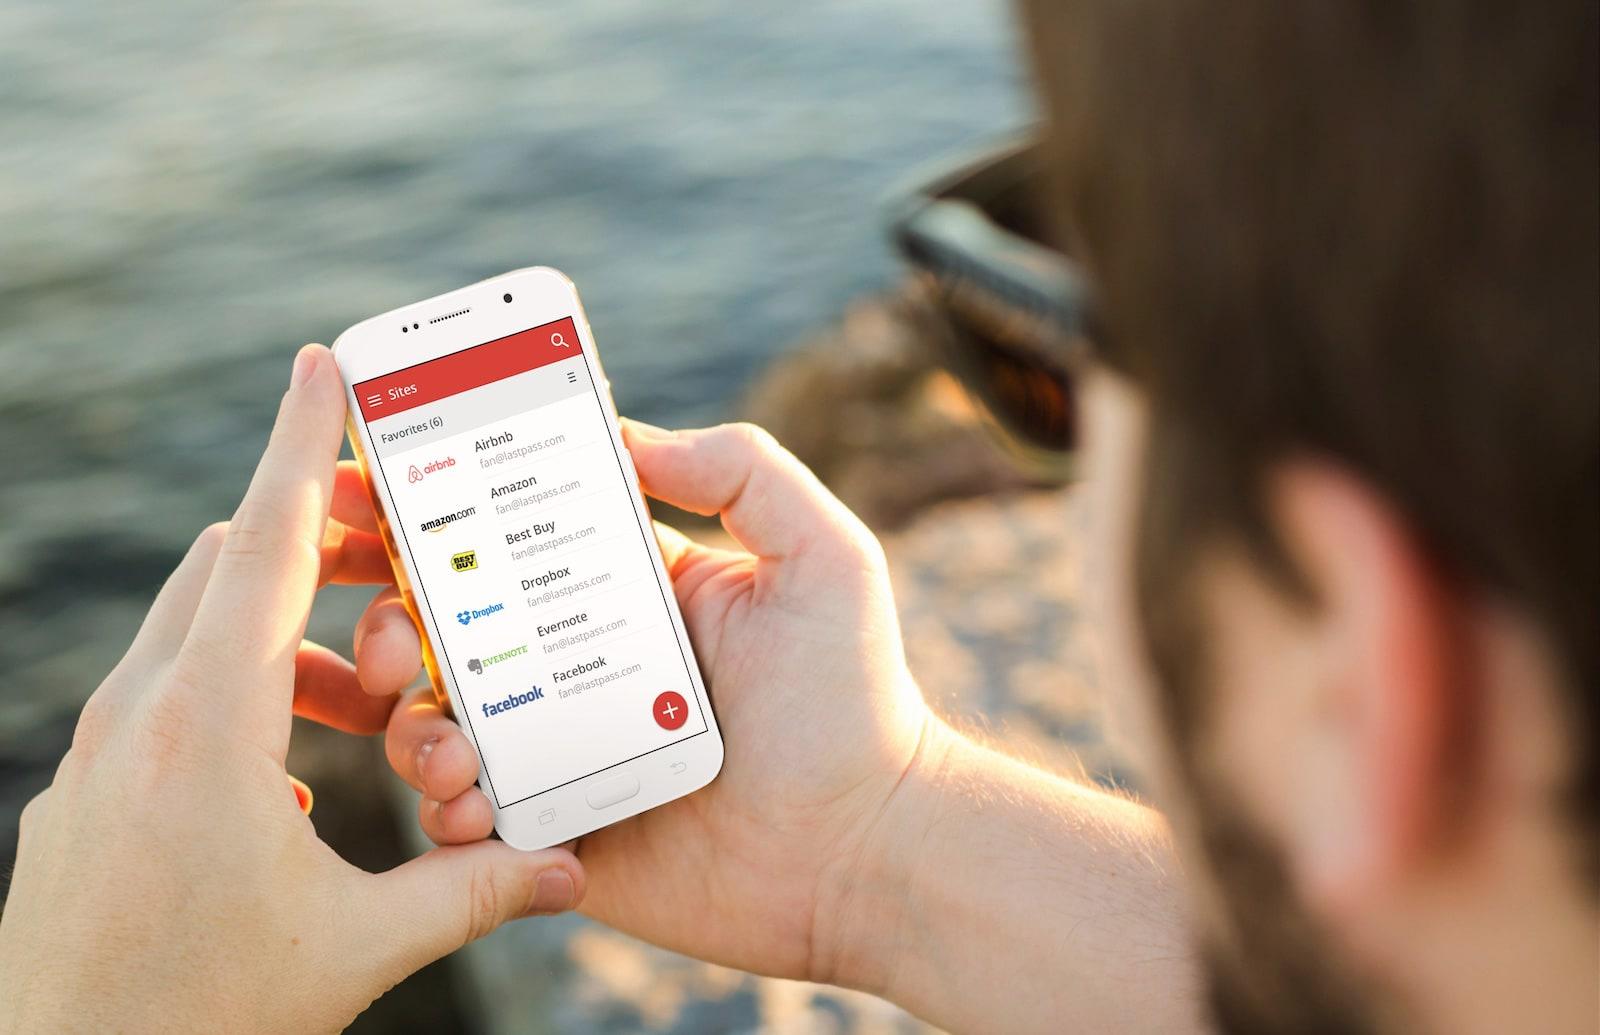 LastPass fixes fingerprint security flaw in its